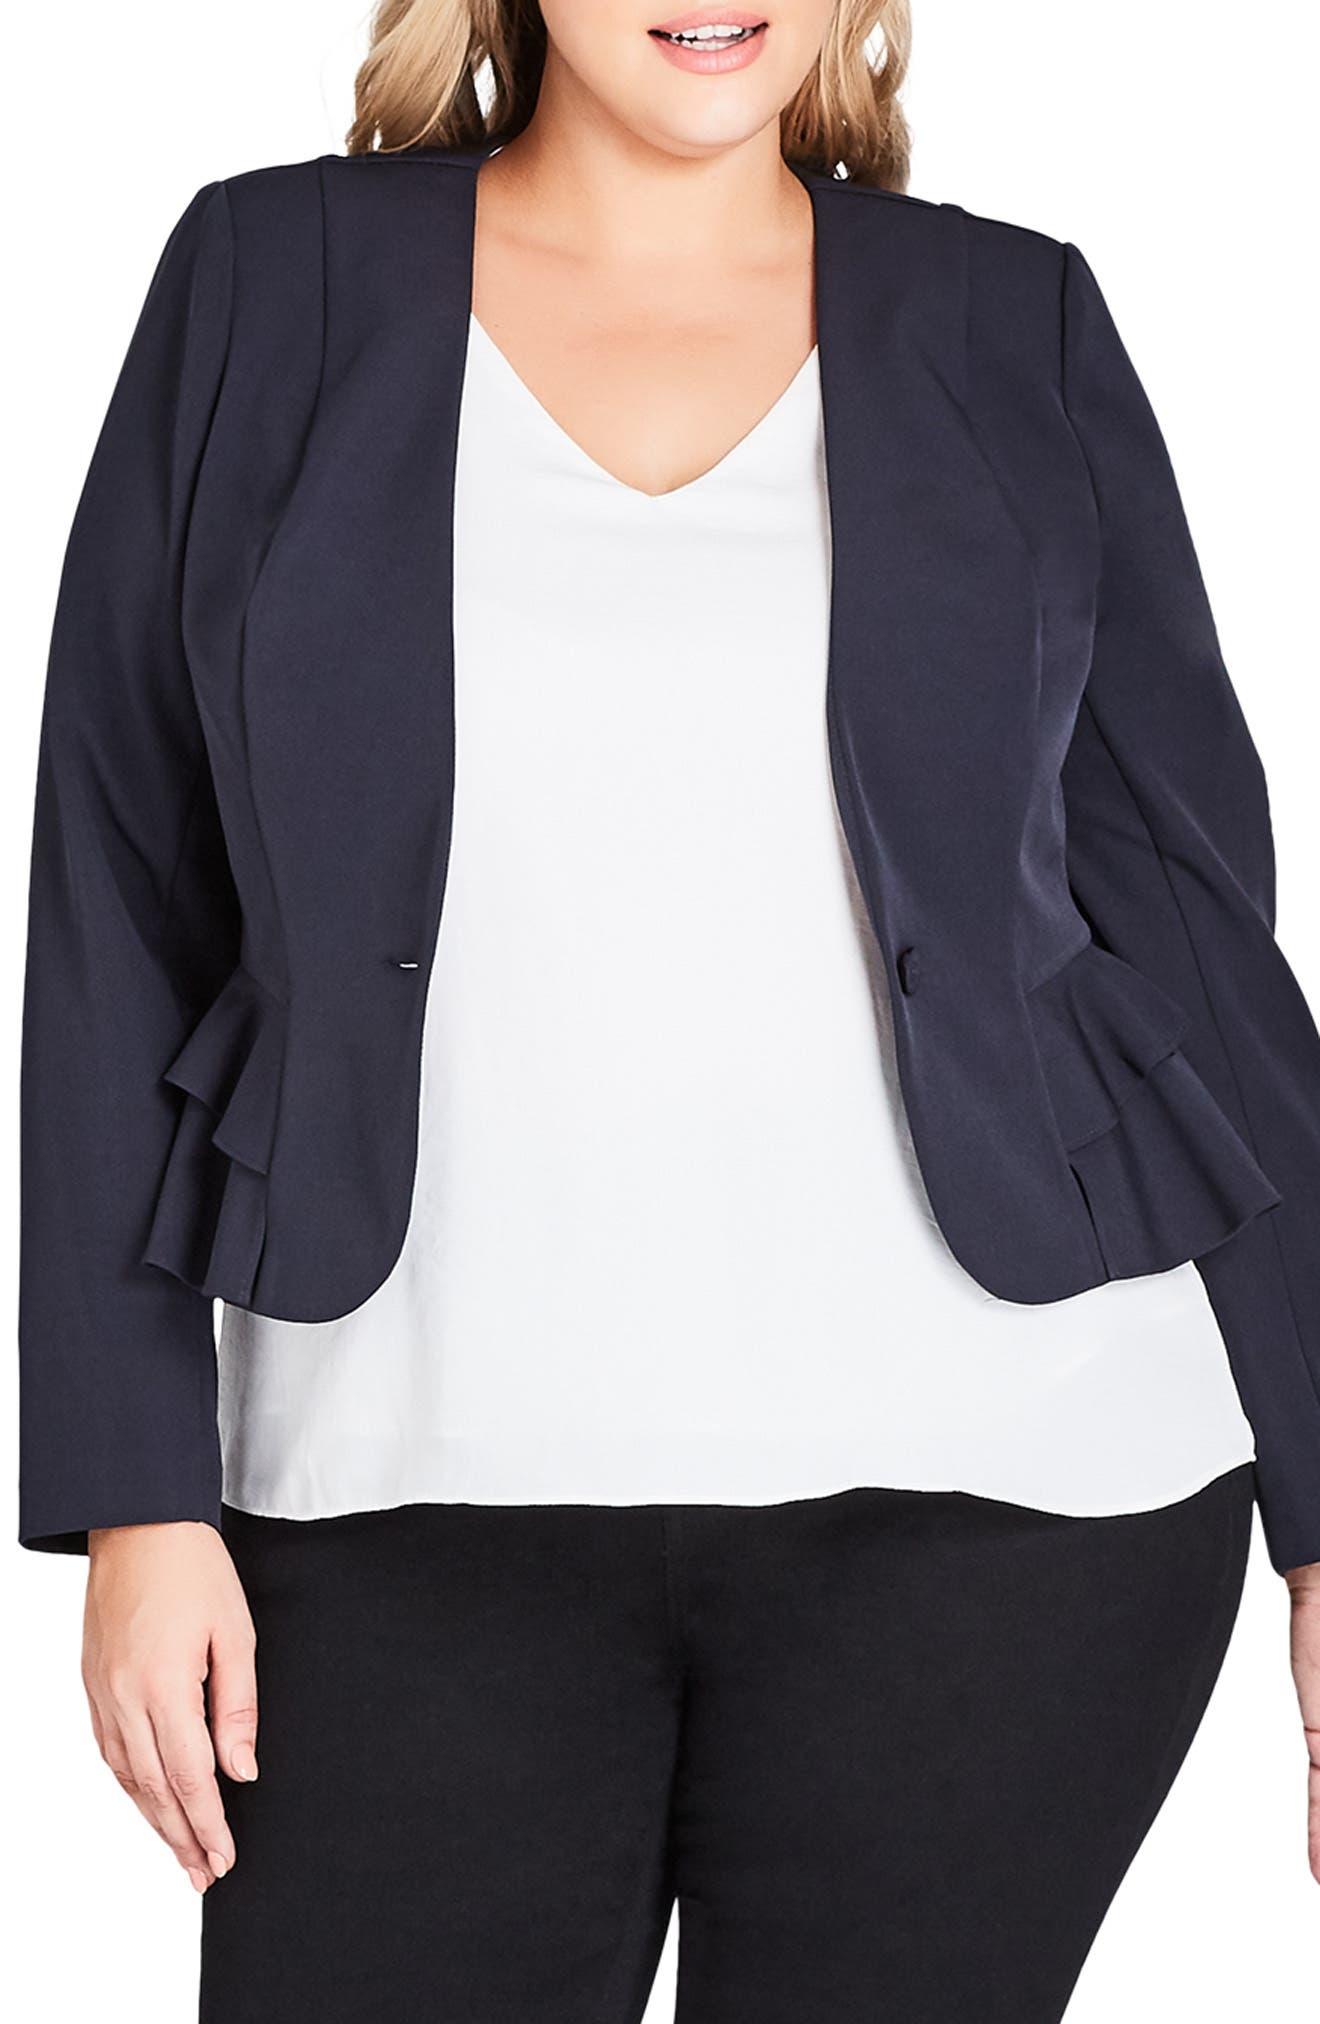 plus size women's city chic petite frill jacket